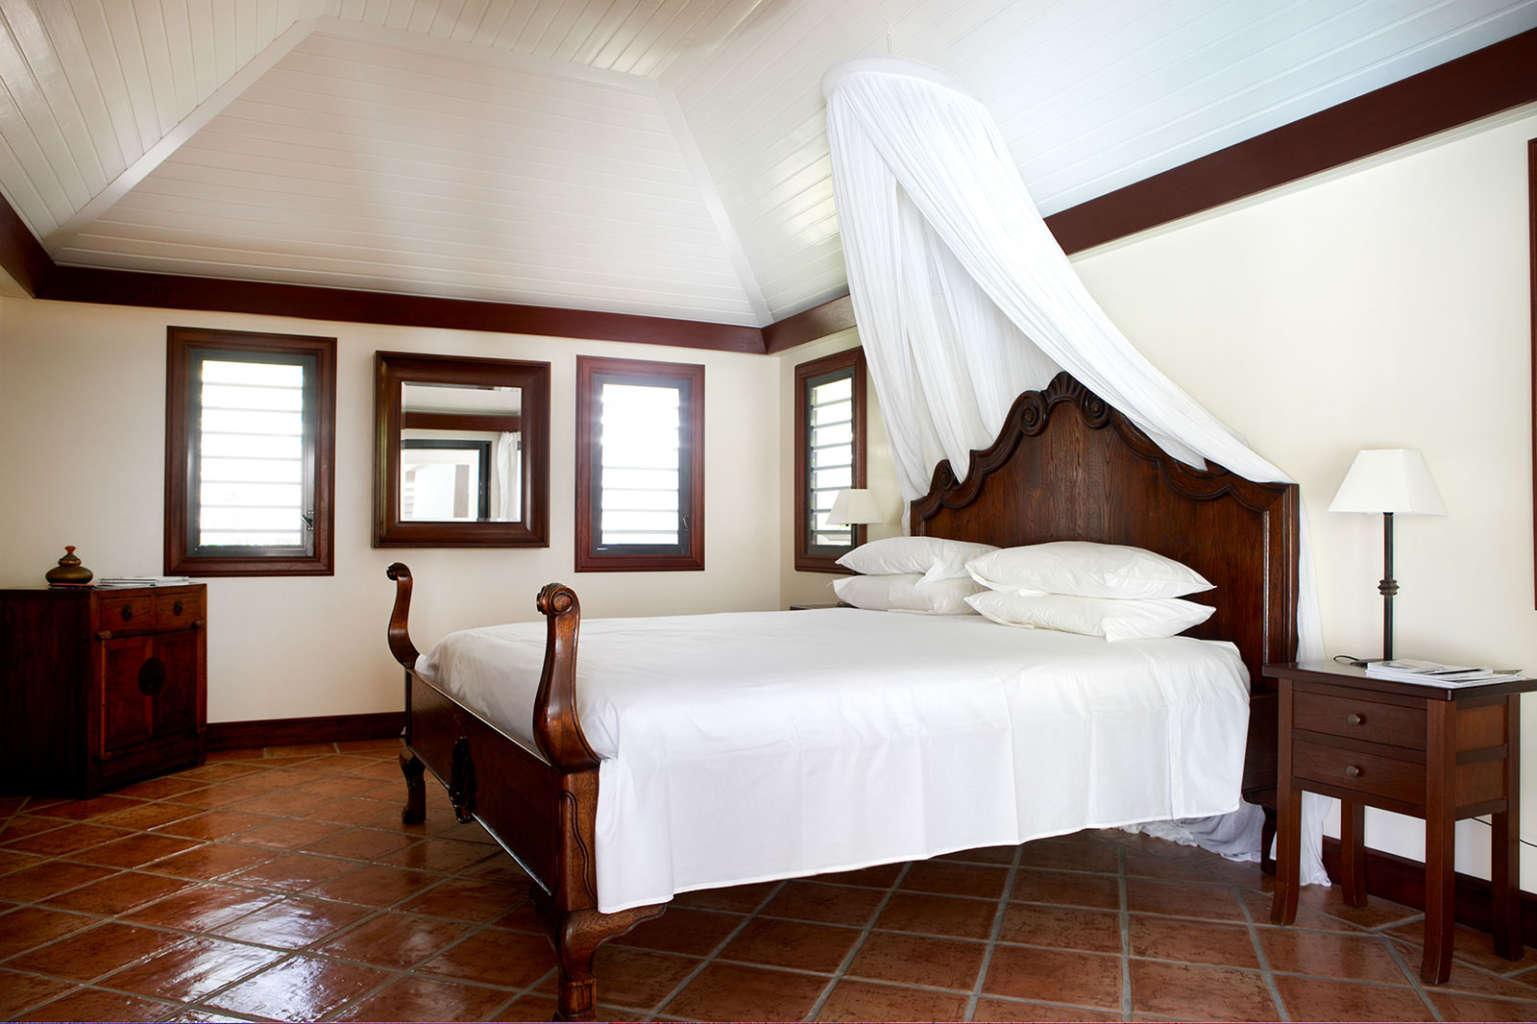 Villa Dei Sogni - 6 Bedroom Villa for Rent St Barth Lorient - Bedroom